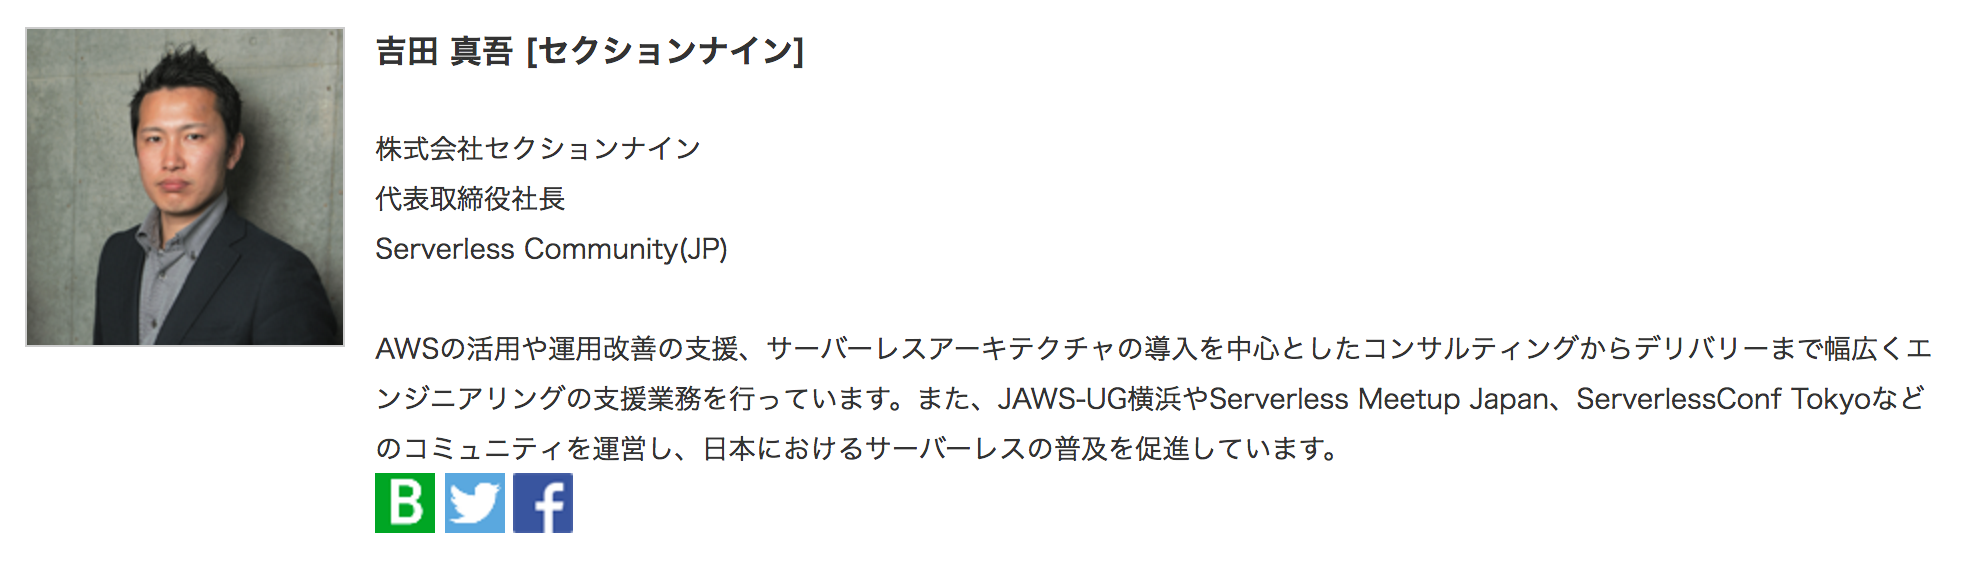 serverless-yoshida